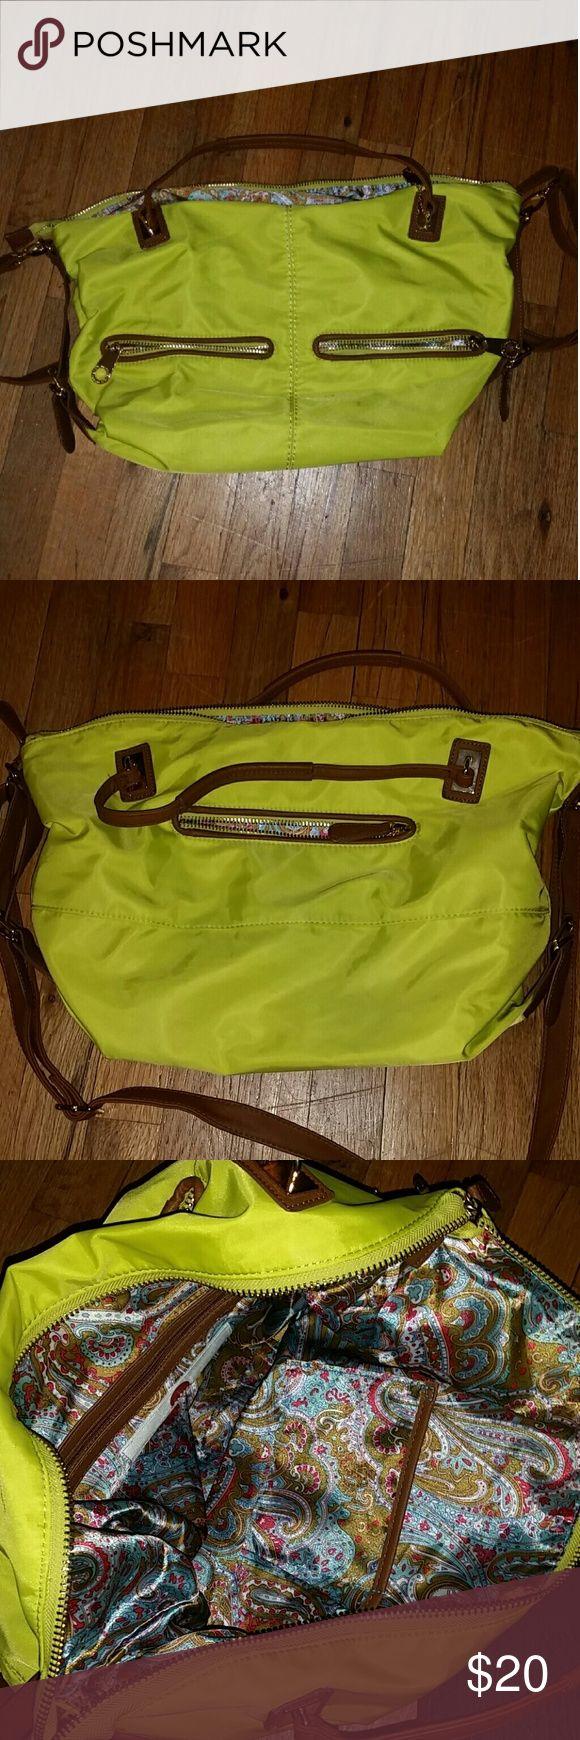 Selling this Big Buddha Neon Yellow/Green Purse on Poshmark! My username is: laurentmoe. #shopmycloset #poshmark #fashion #shopping #style #forsale #Big Buddha #Handbags